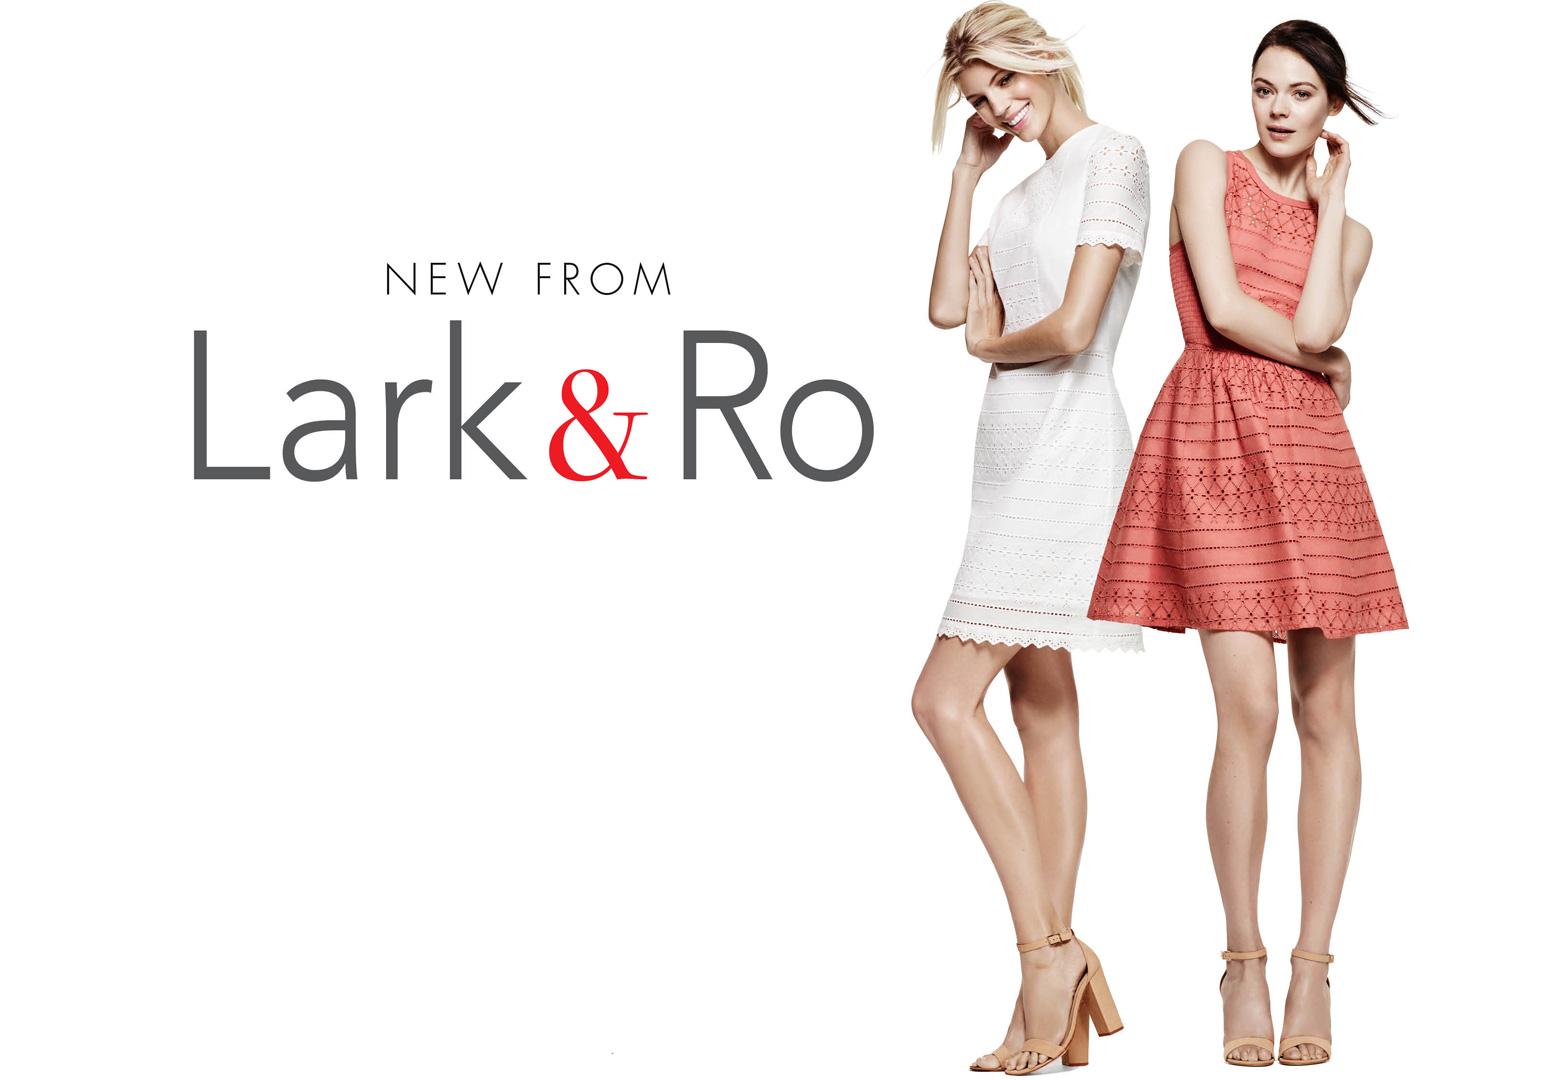 NEW FROM Lark & Ro